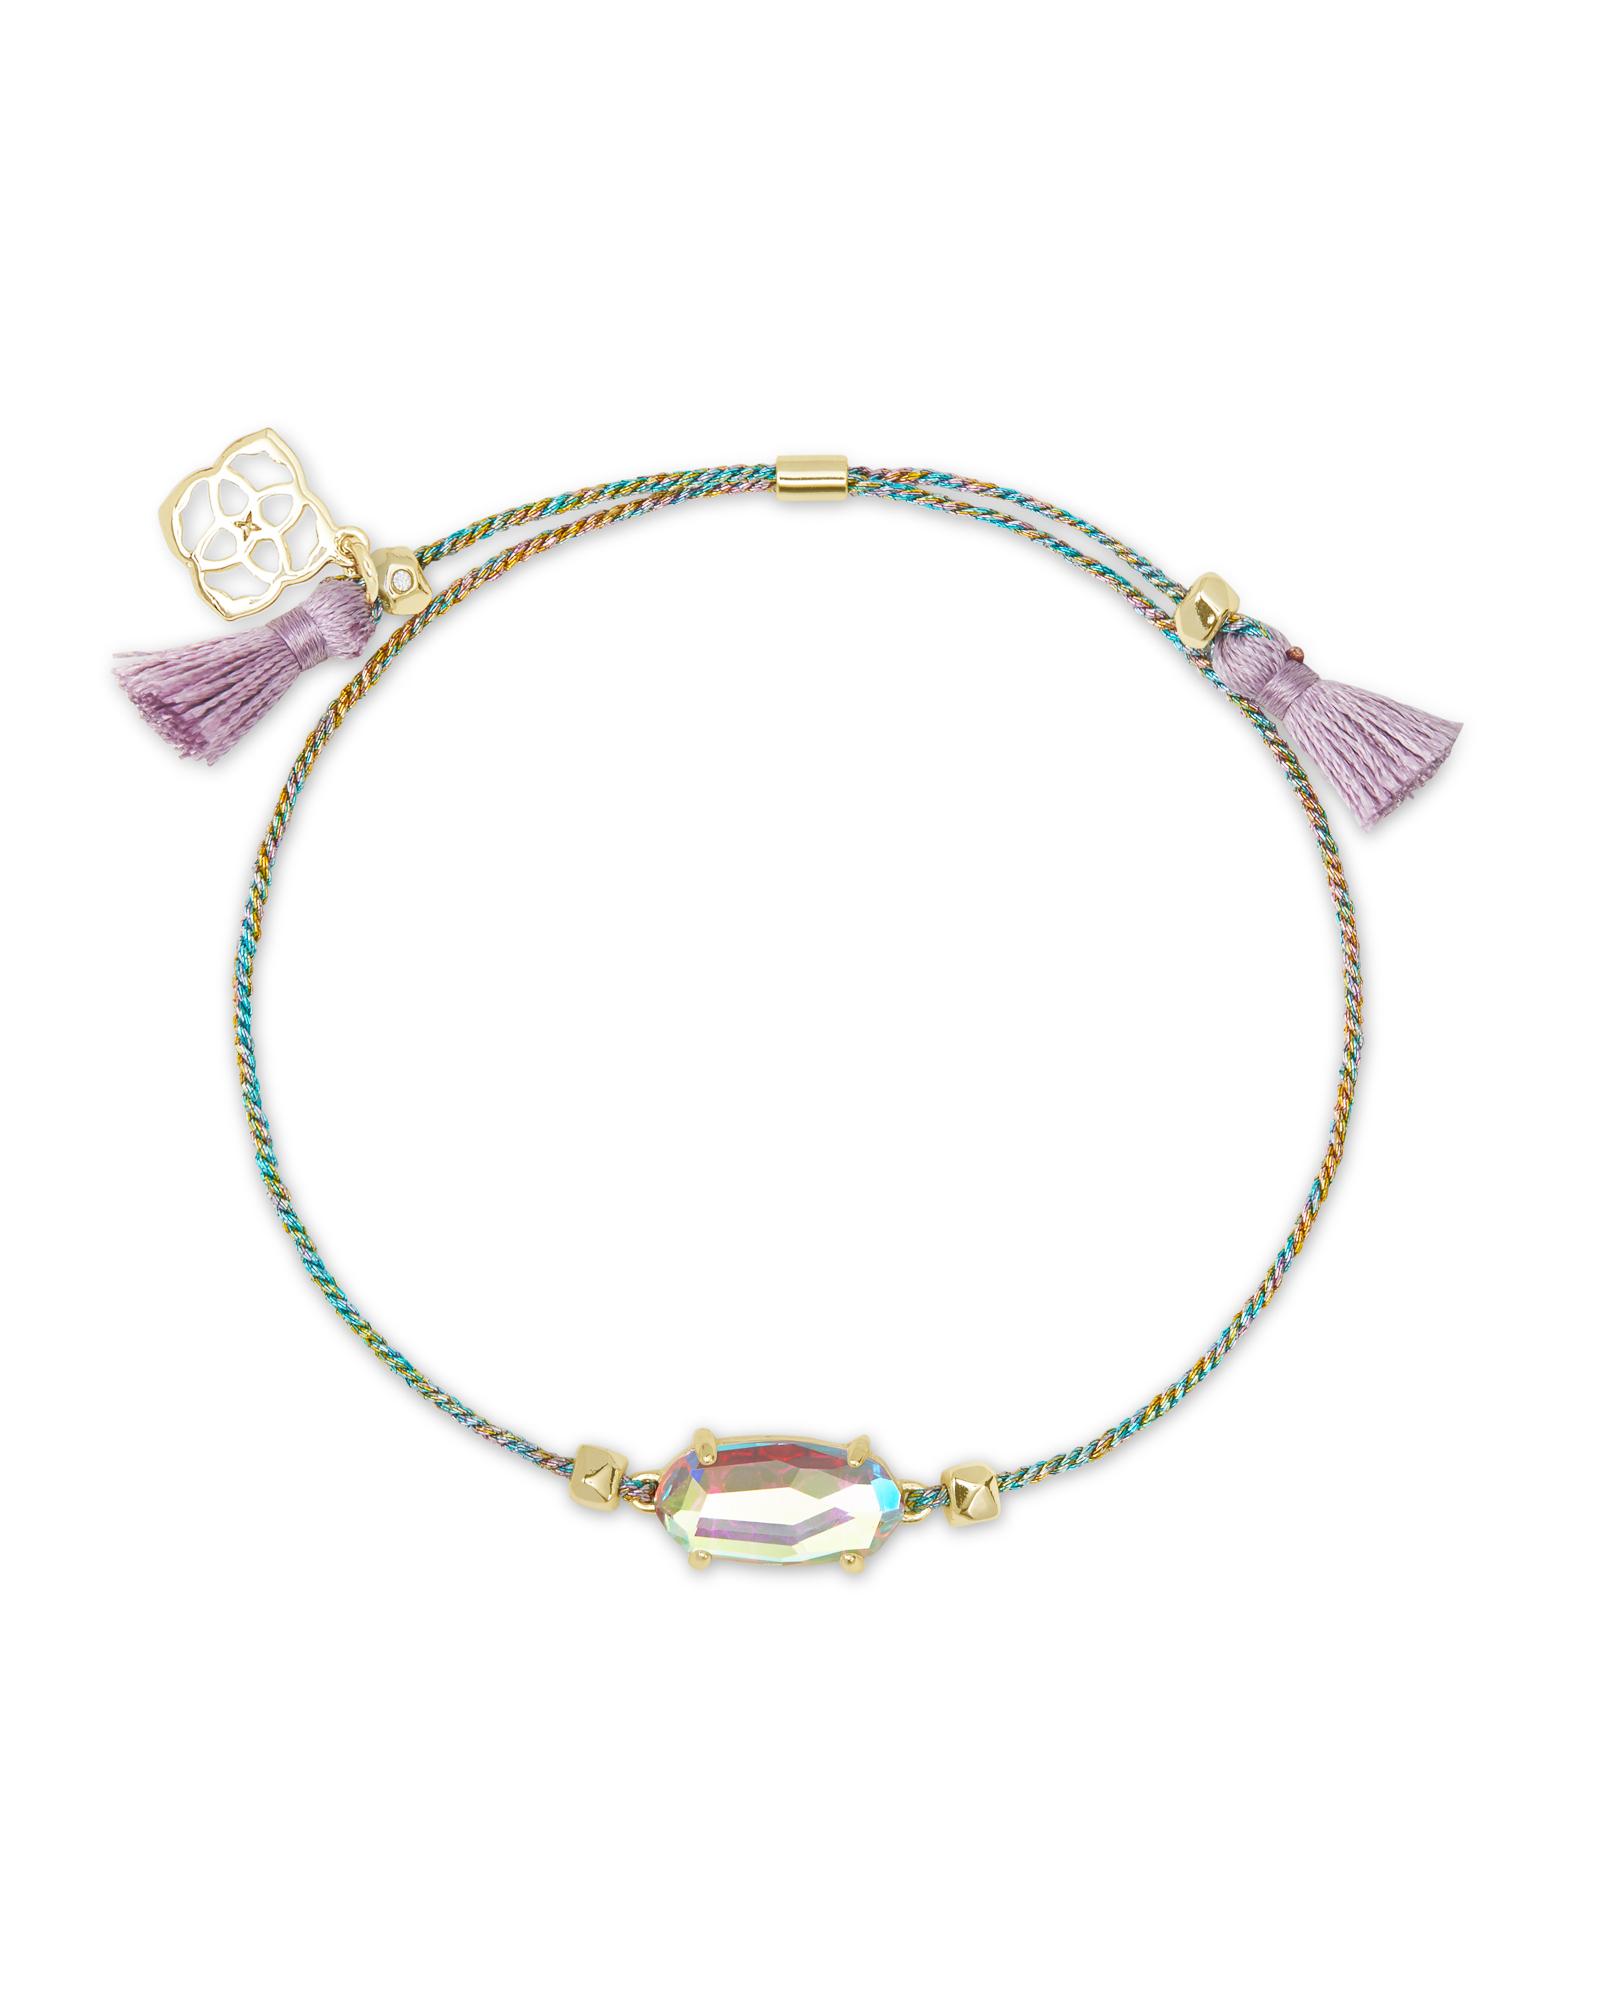 Gold and purple bracelet